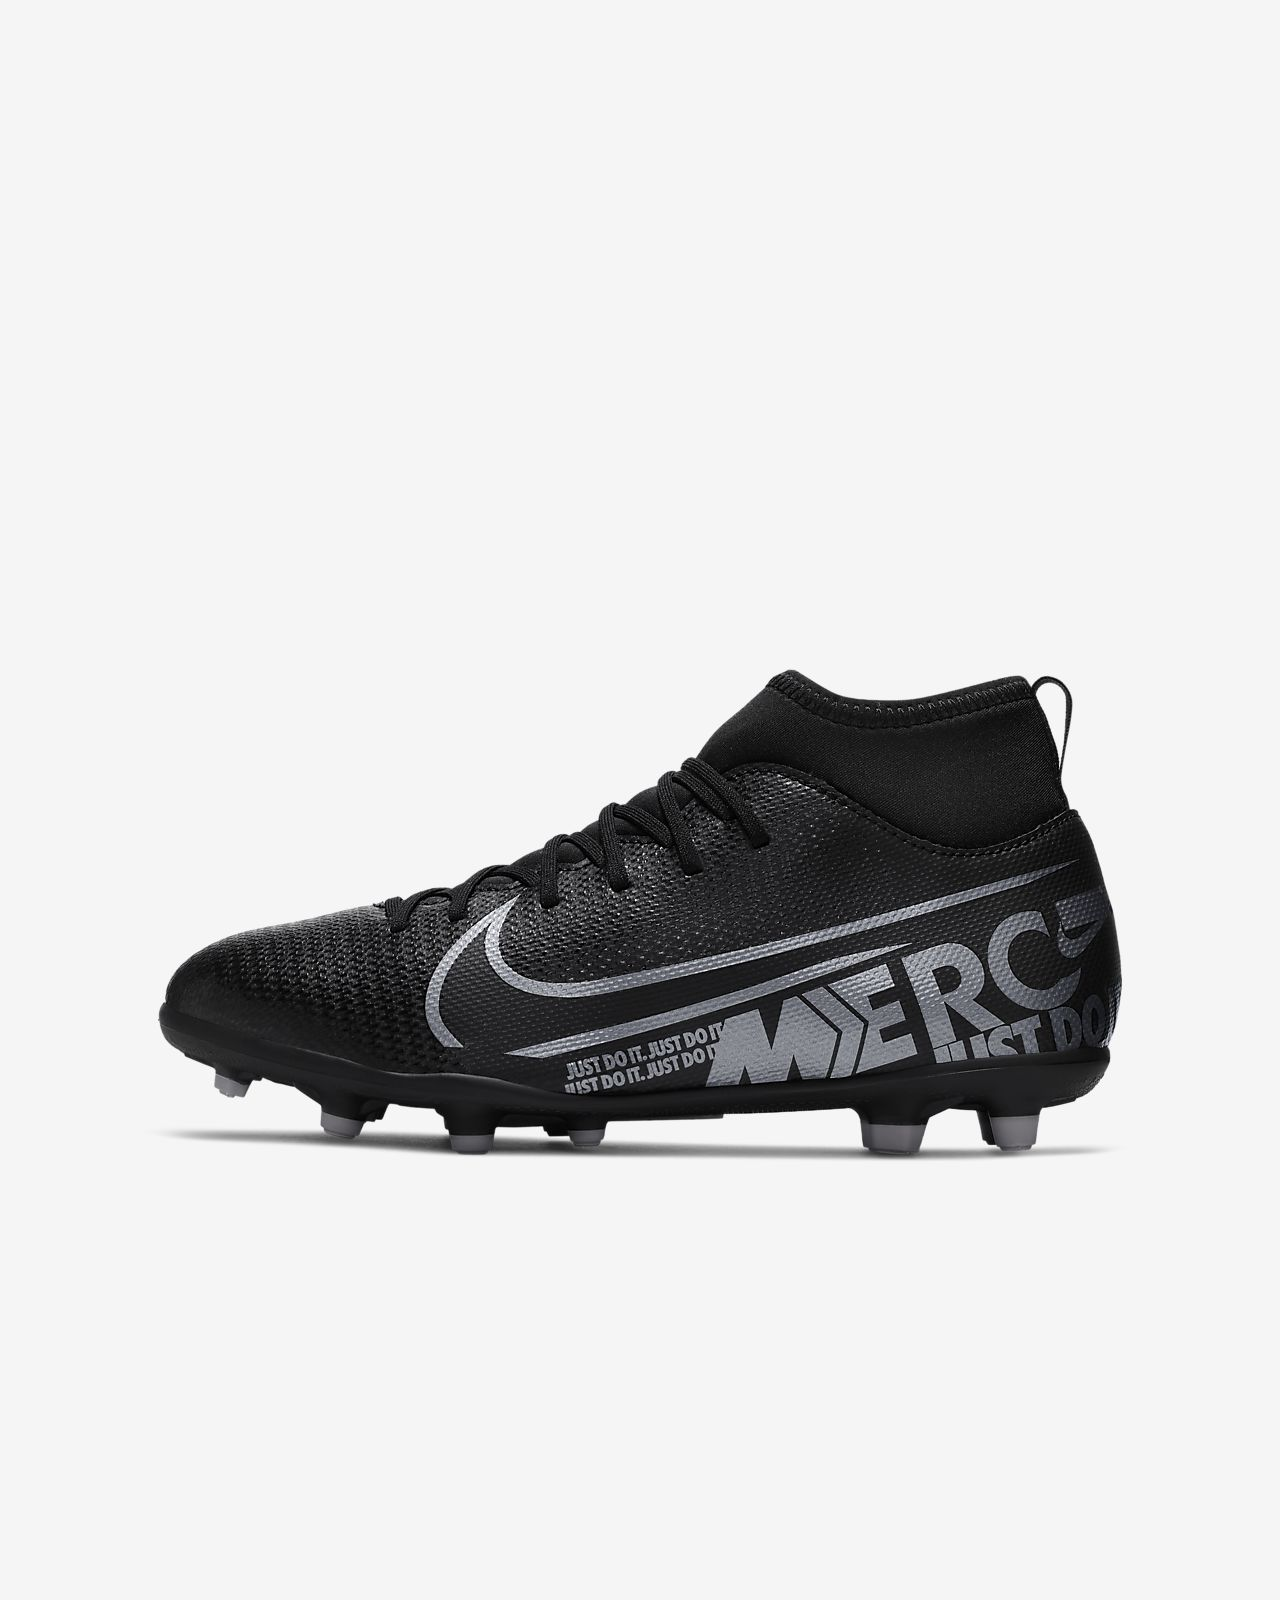 low priced dab5c aeabc Taco de fútbol para múltiples superficies para niños talla pequeña/grande  Nike Jr. Mercurial Superfly 7 Club MG